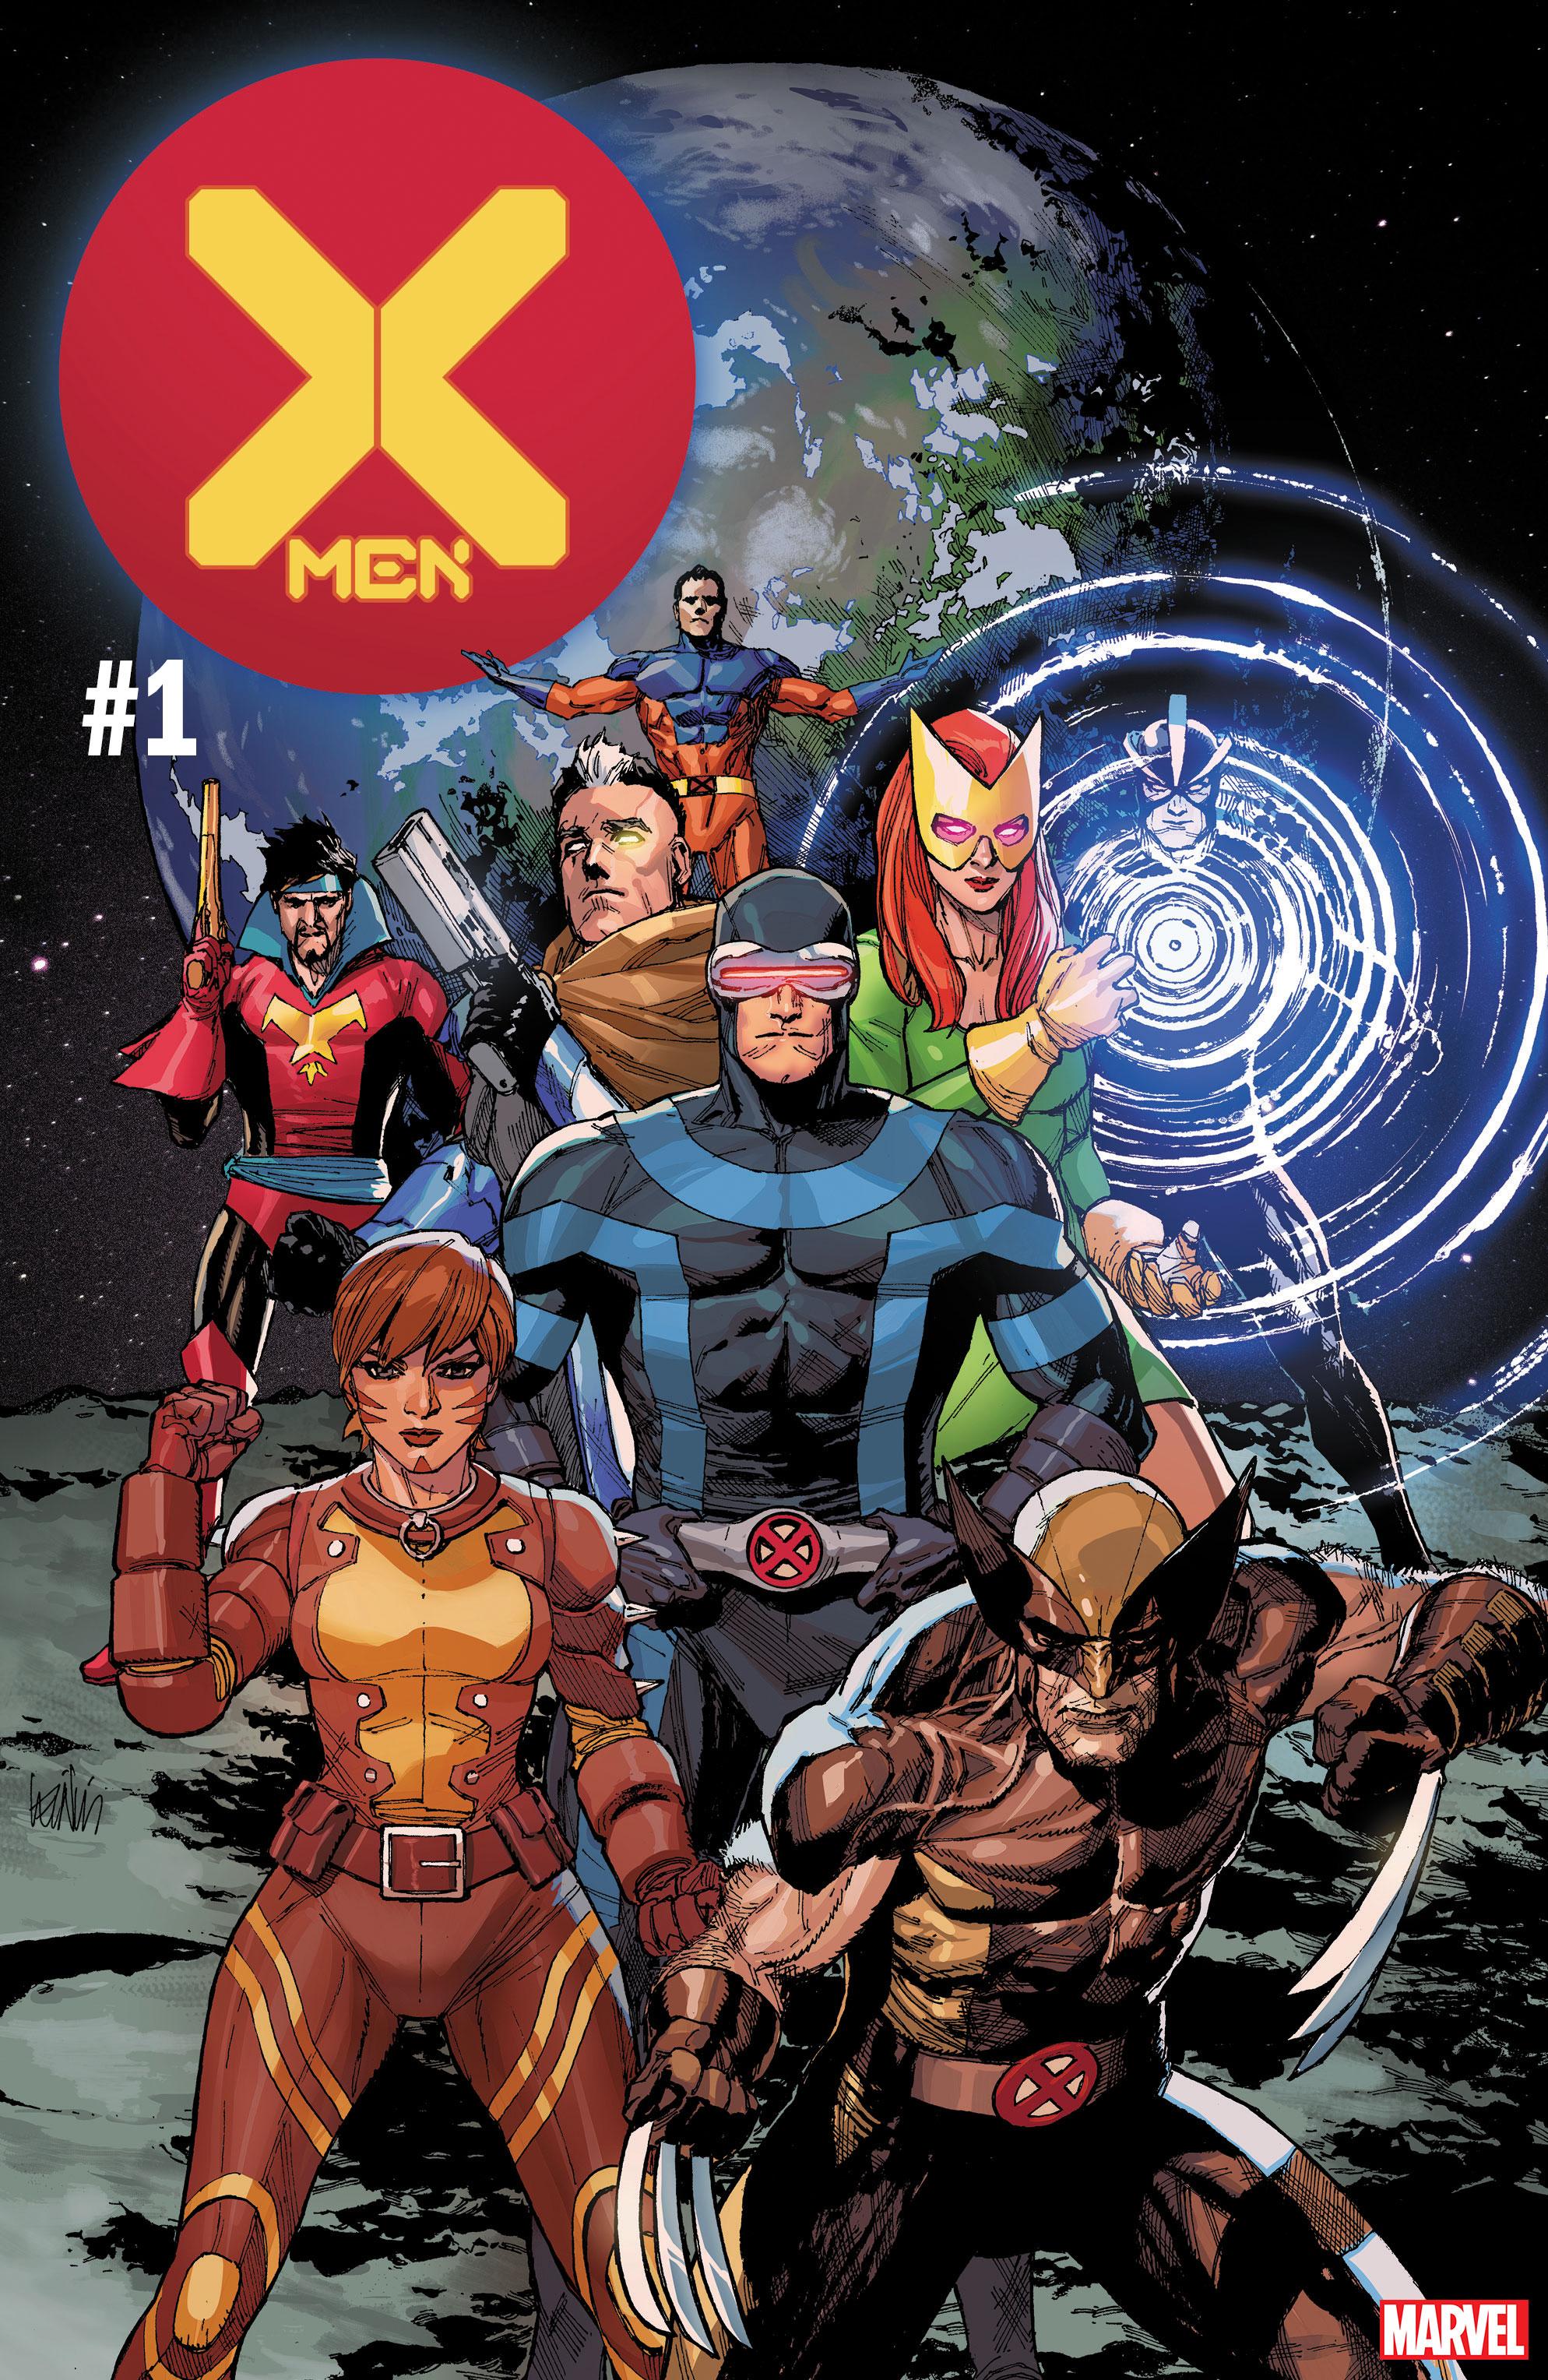 The cover of X-Men #1, Marvel Comics (2019).